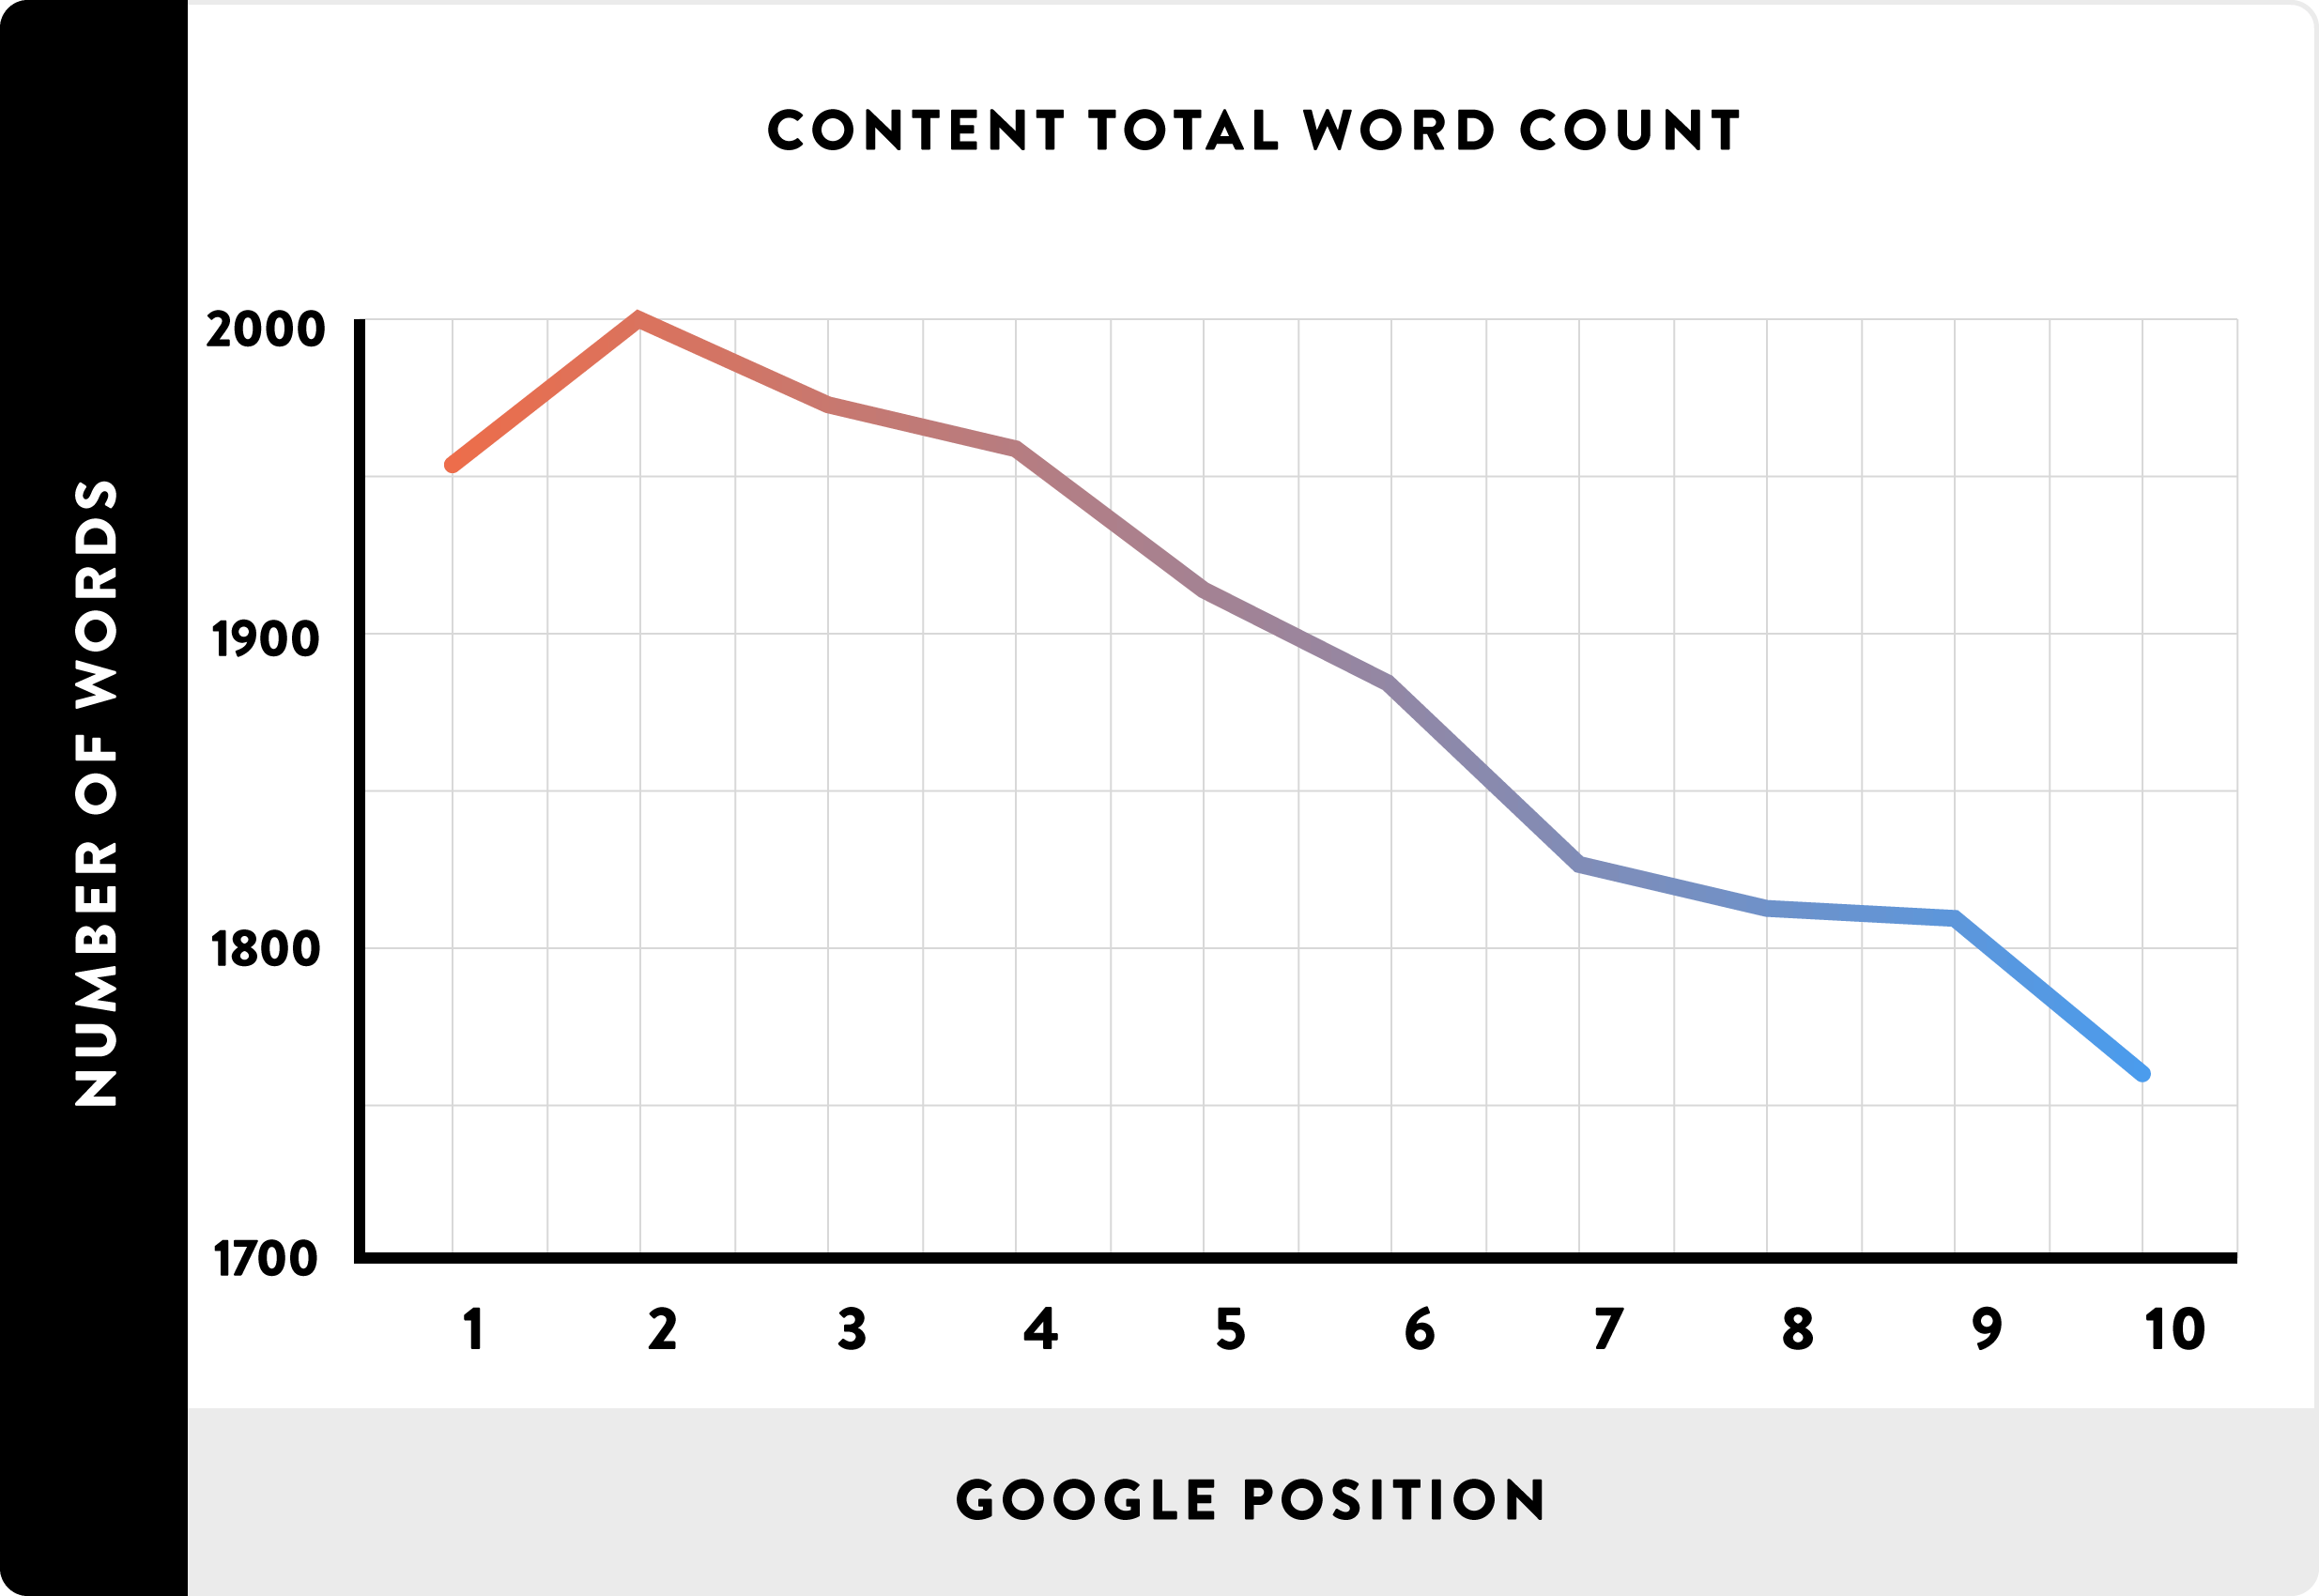 طول محتوا یا تعداد کلمات محتوا